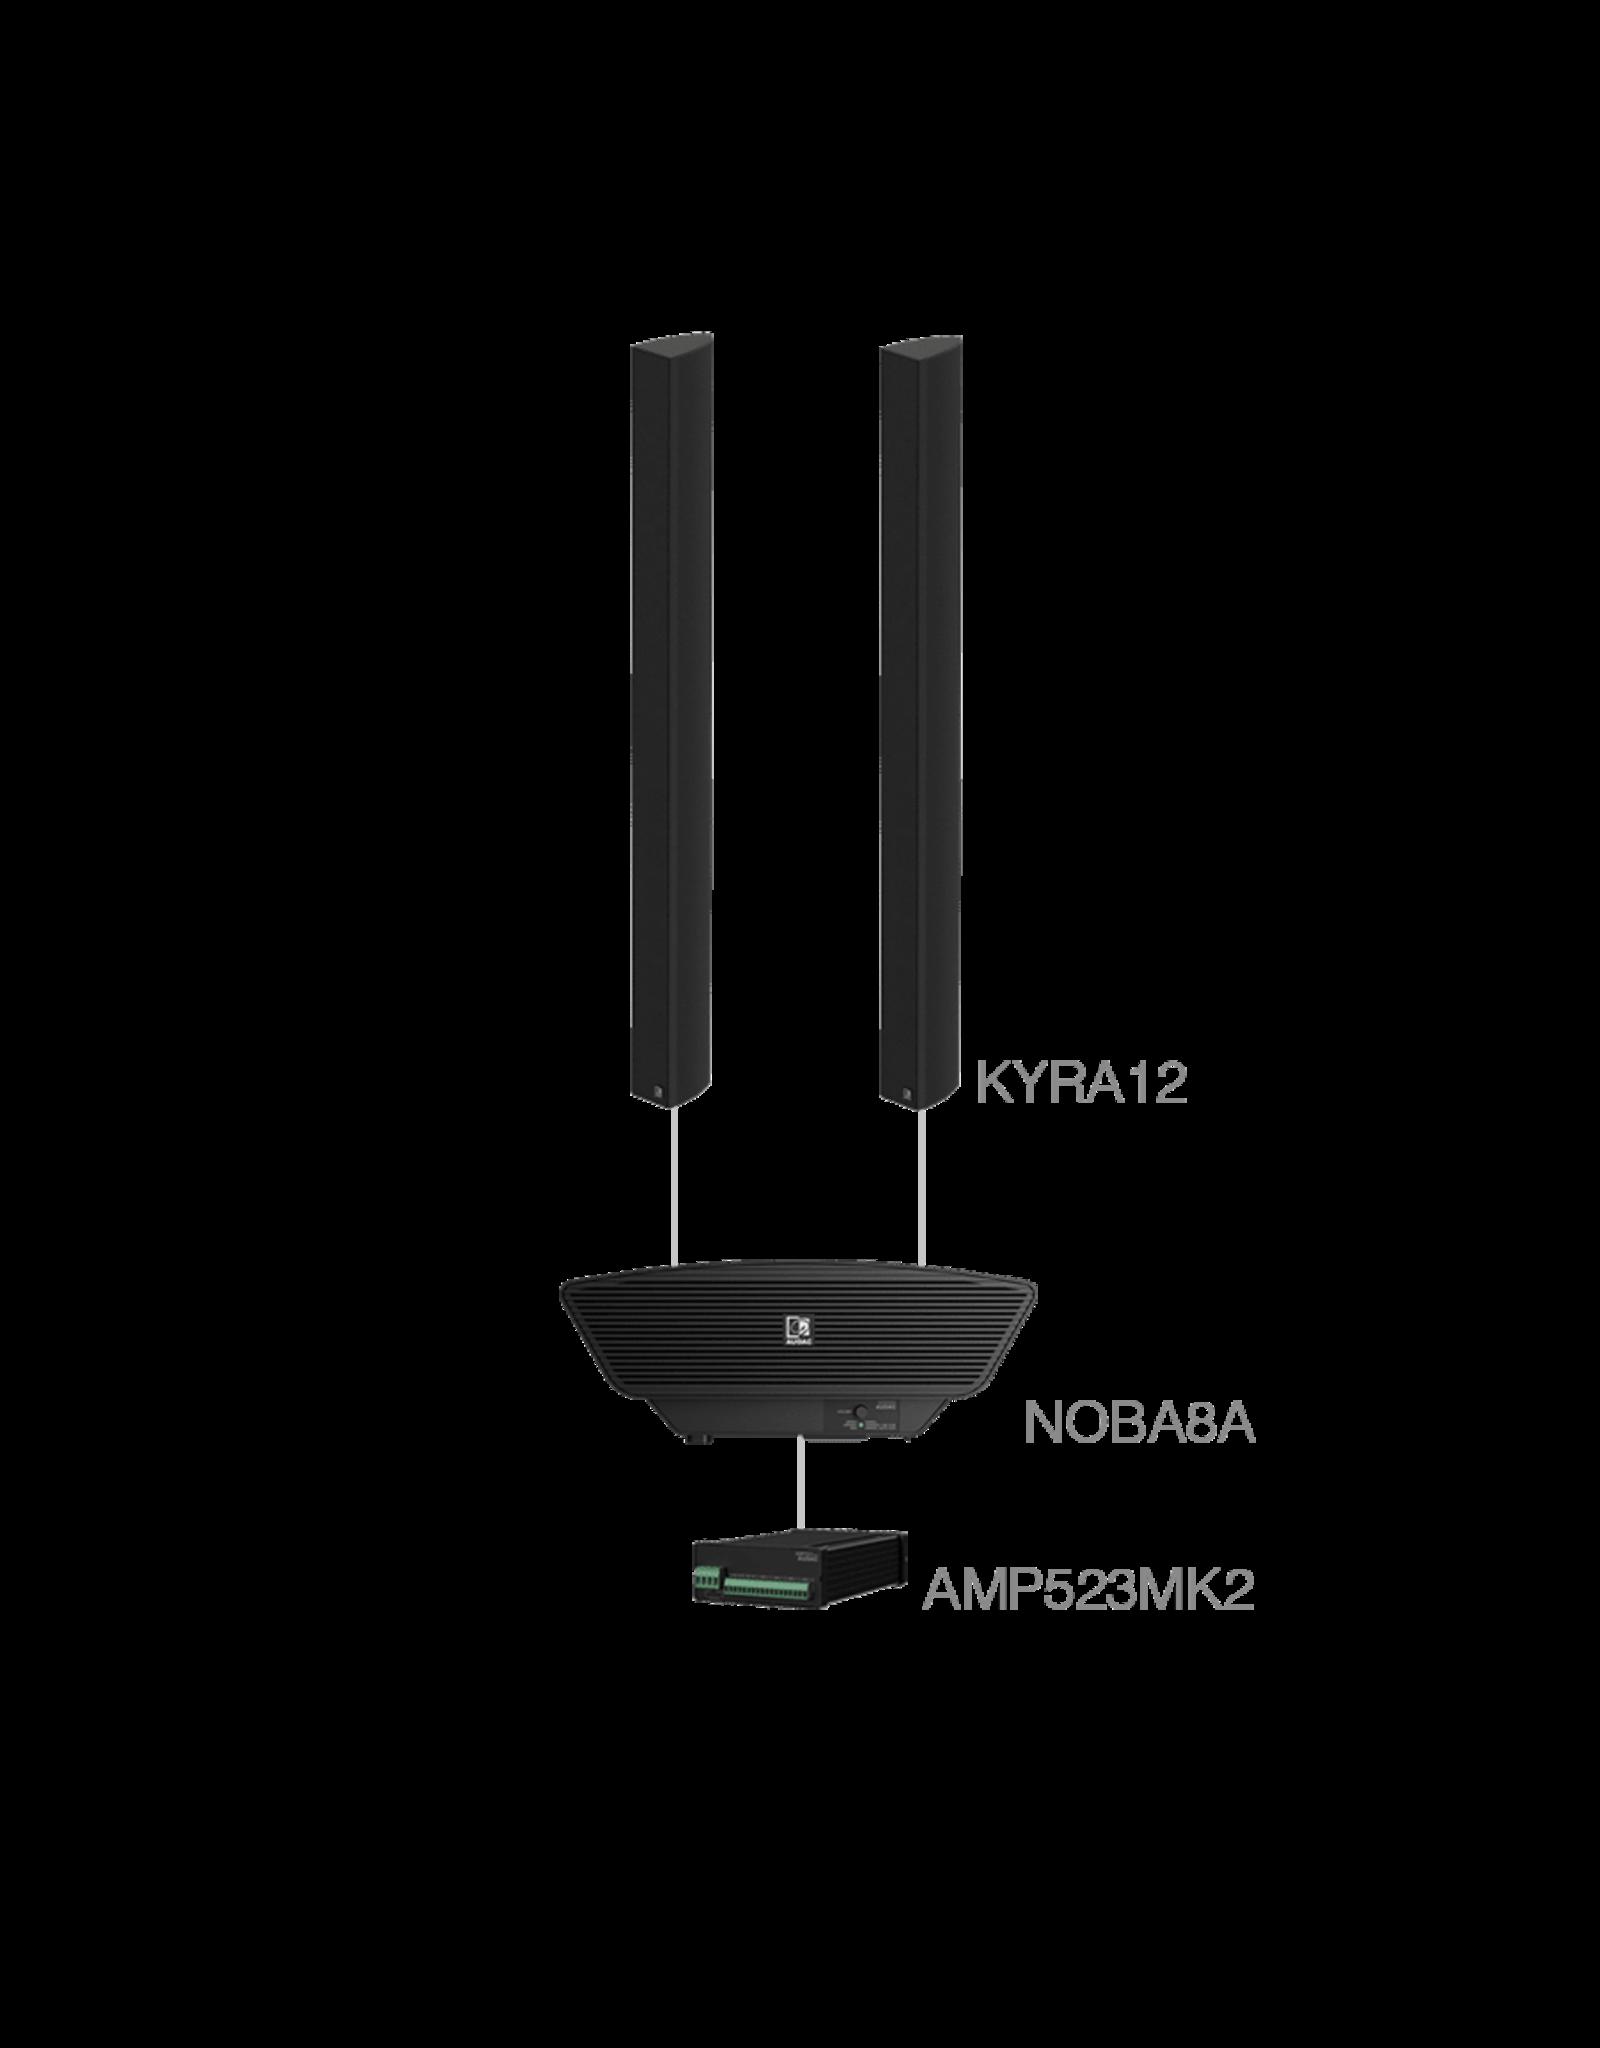 Audac 2 x KYRA12 + NOBA8A + AMP523MK2 Black